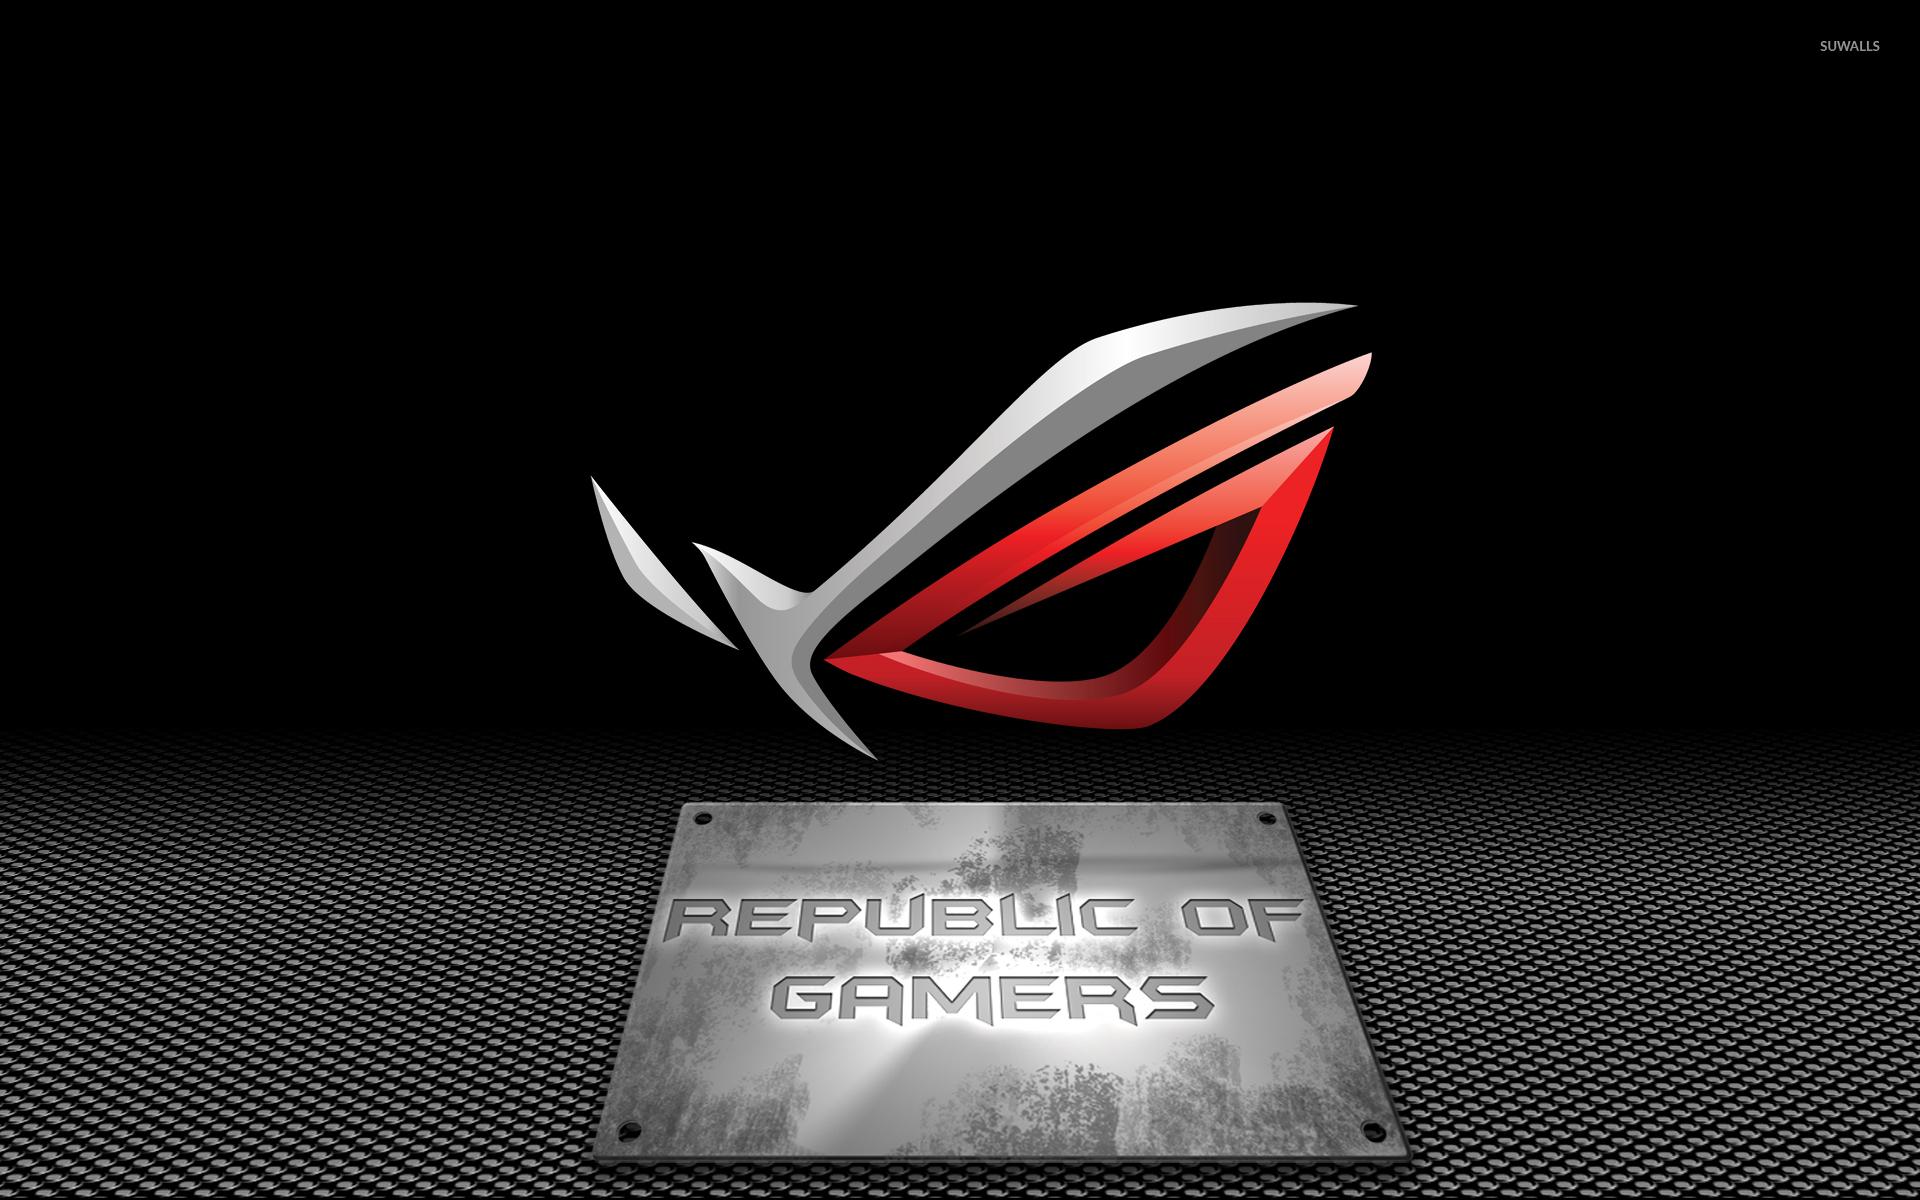 Republic of Gamers wallpaper   Computer wallpapers   4473 1366x768